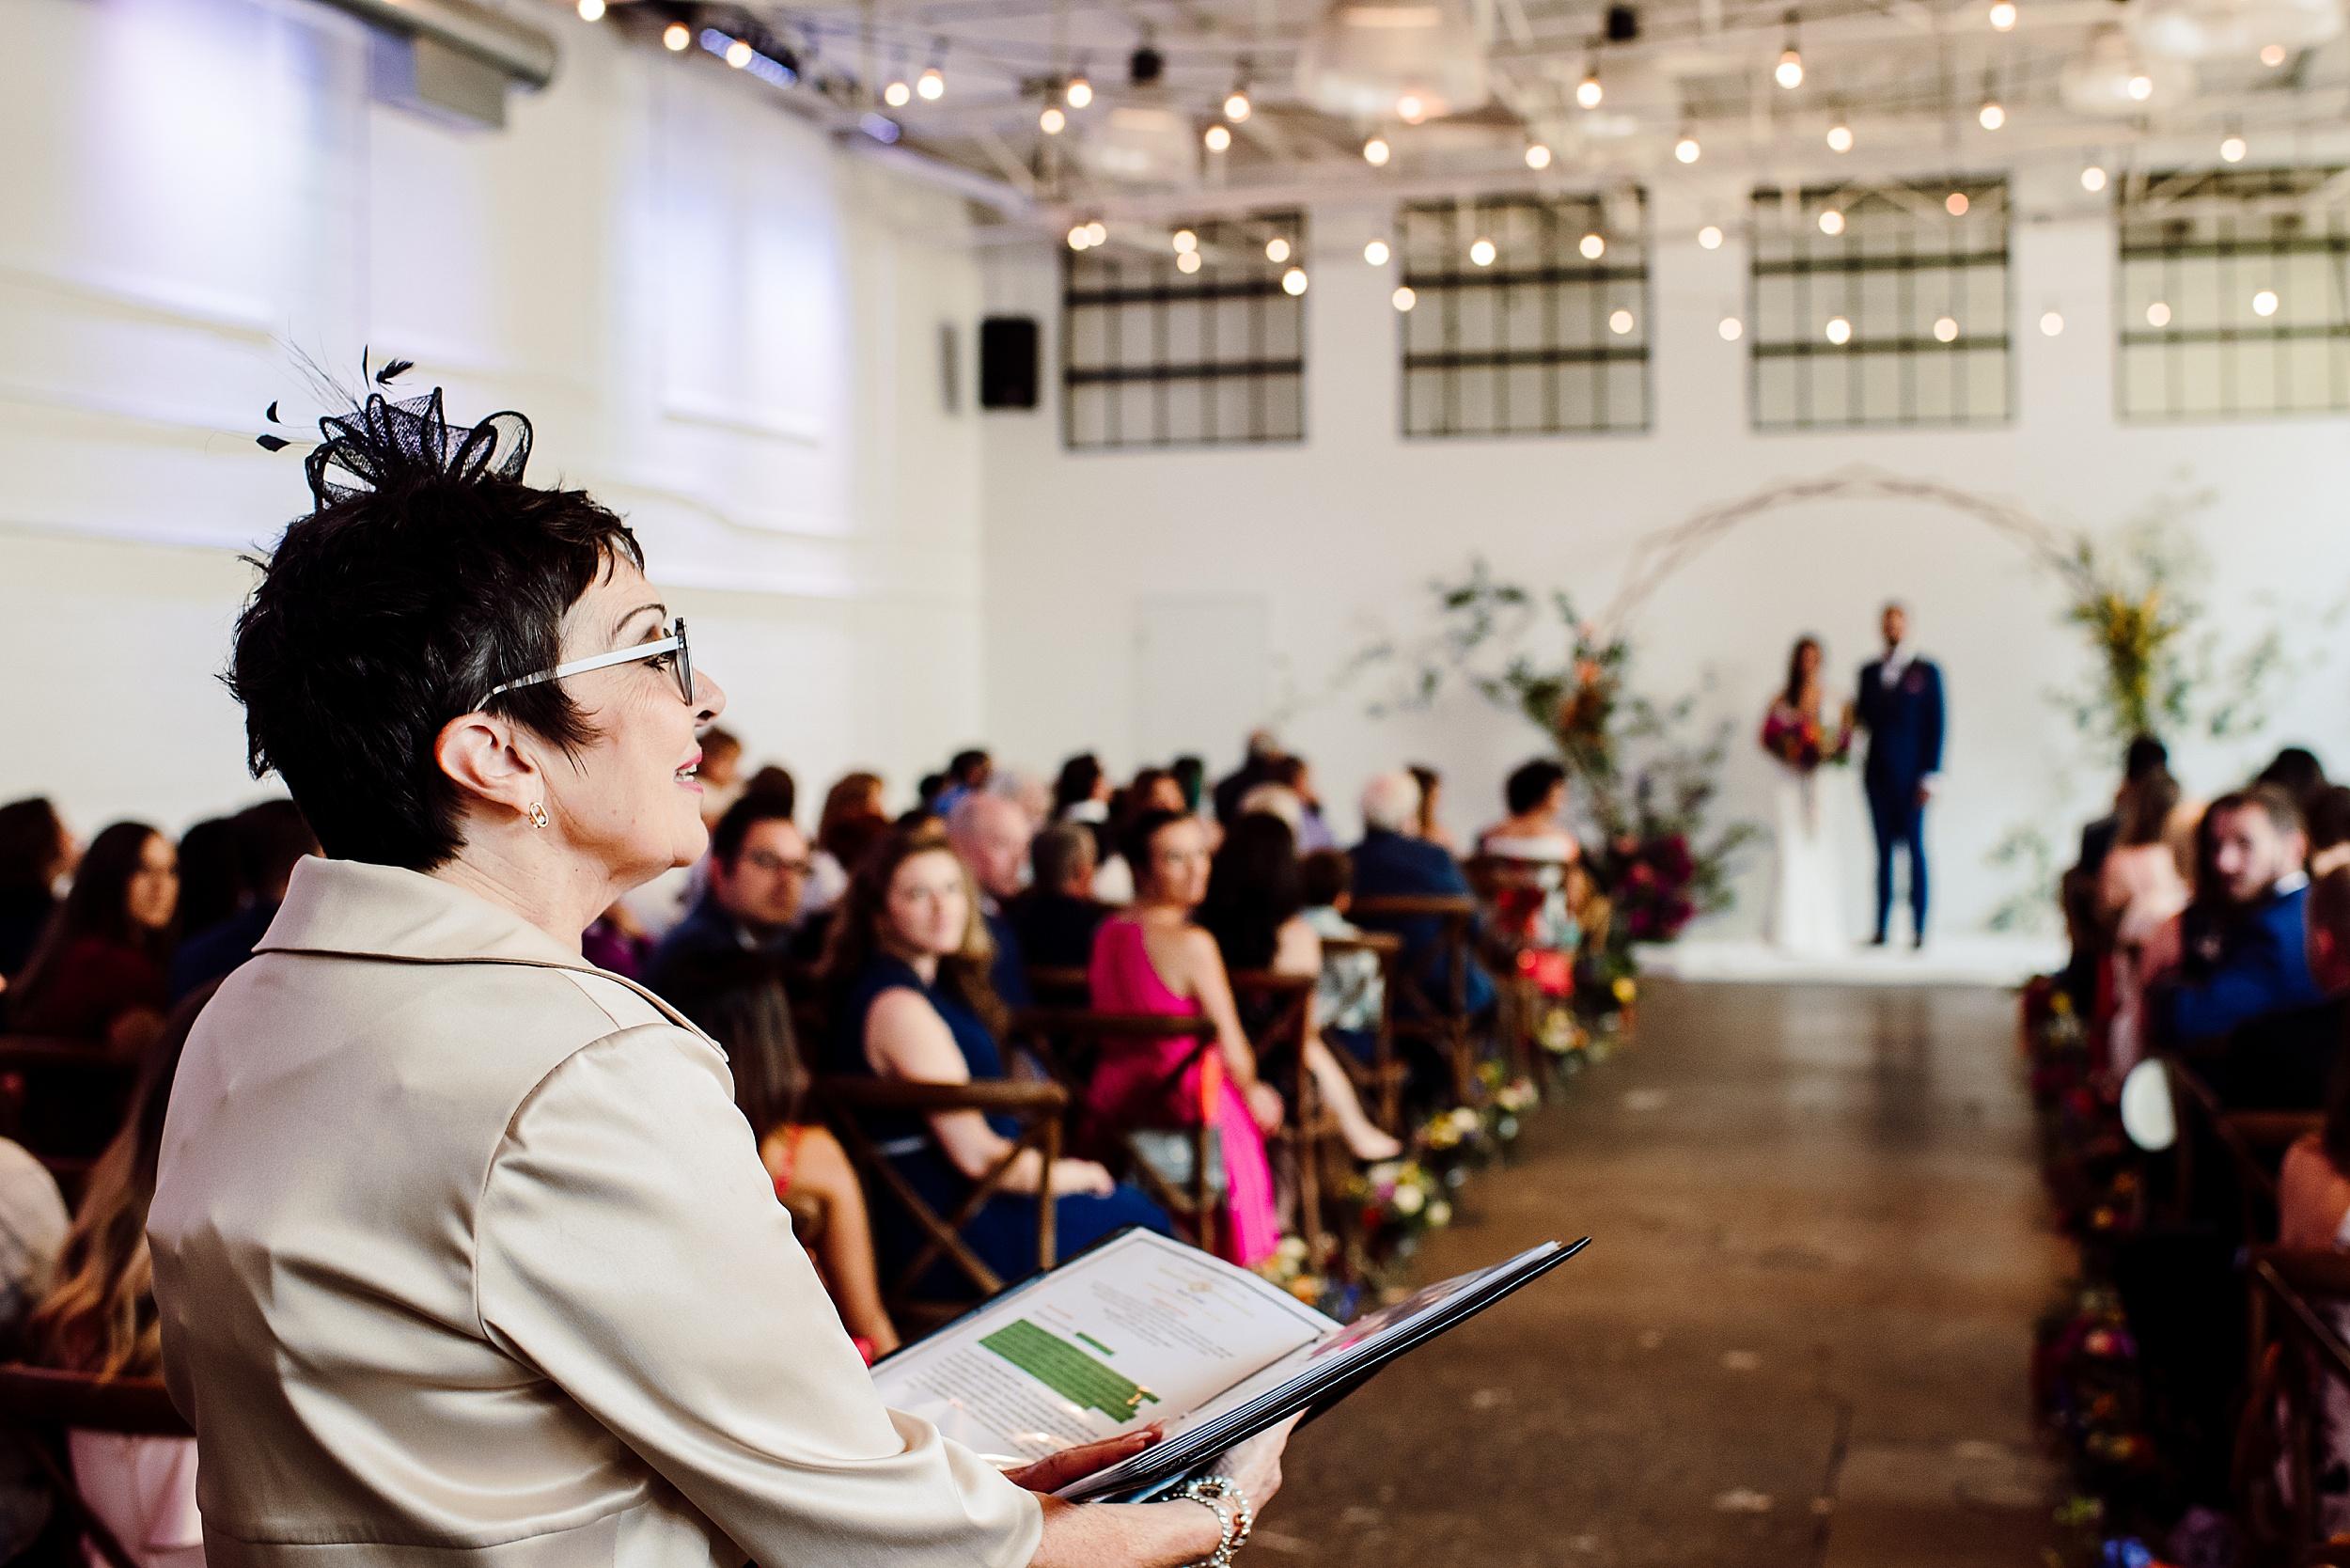 Airship-37-Berkeley-Events-Distillery-District-Wedding-Toronto-Wedding-Photographers_0063.jpg